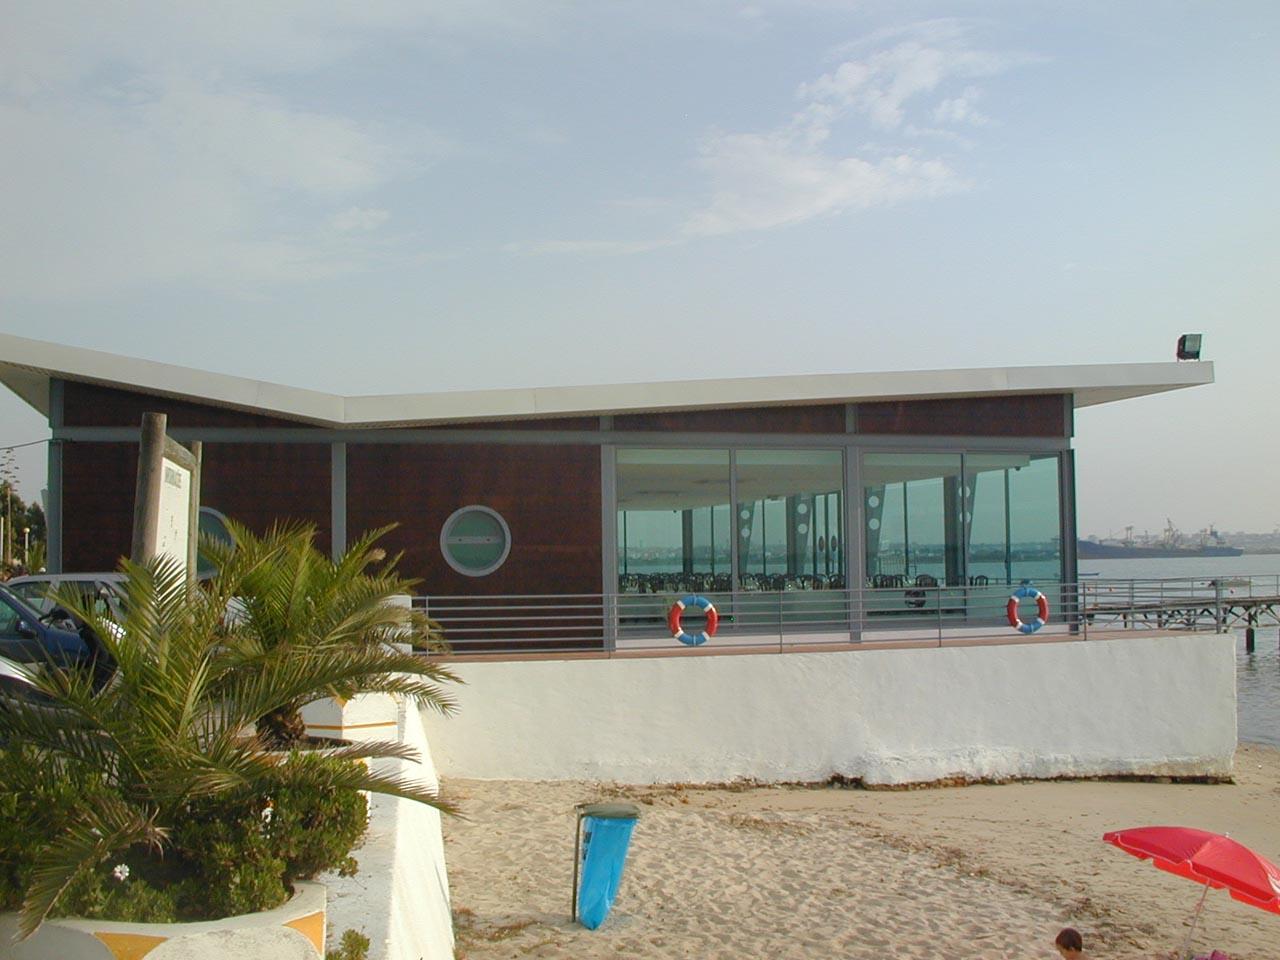 https://www.araujo-arquitectura.pt/wp-content/uploads/2020/12/DSCN00011.jpg